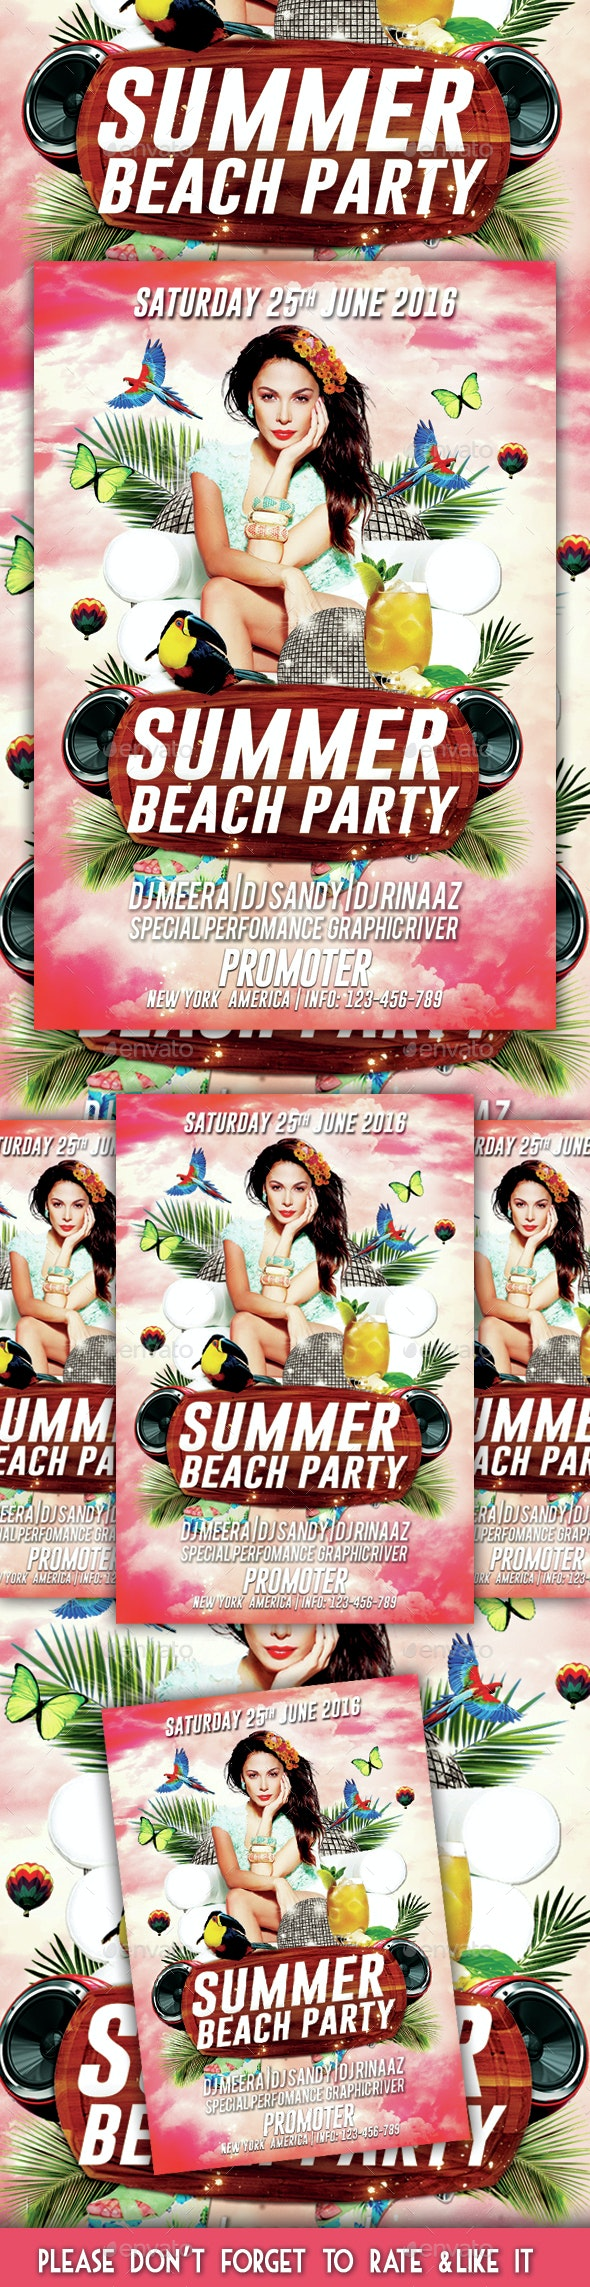 Summer Beach Party Flyer 2 - Flyers Print Templates